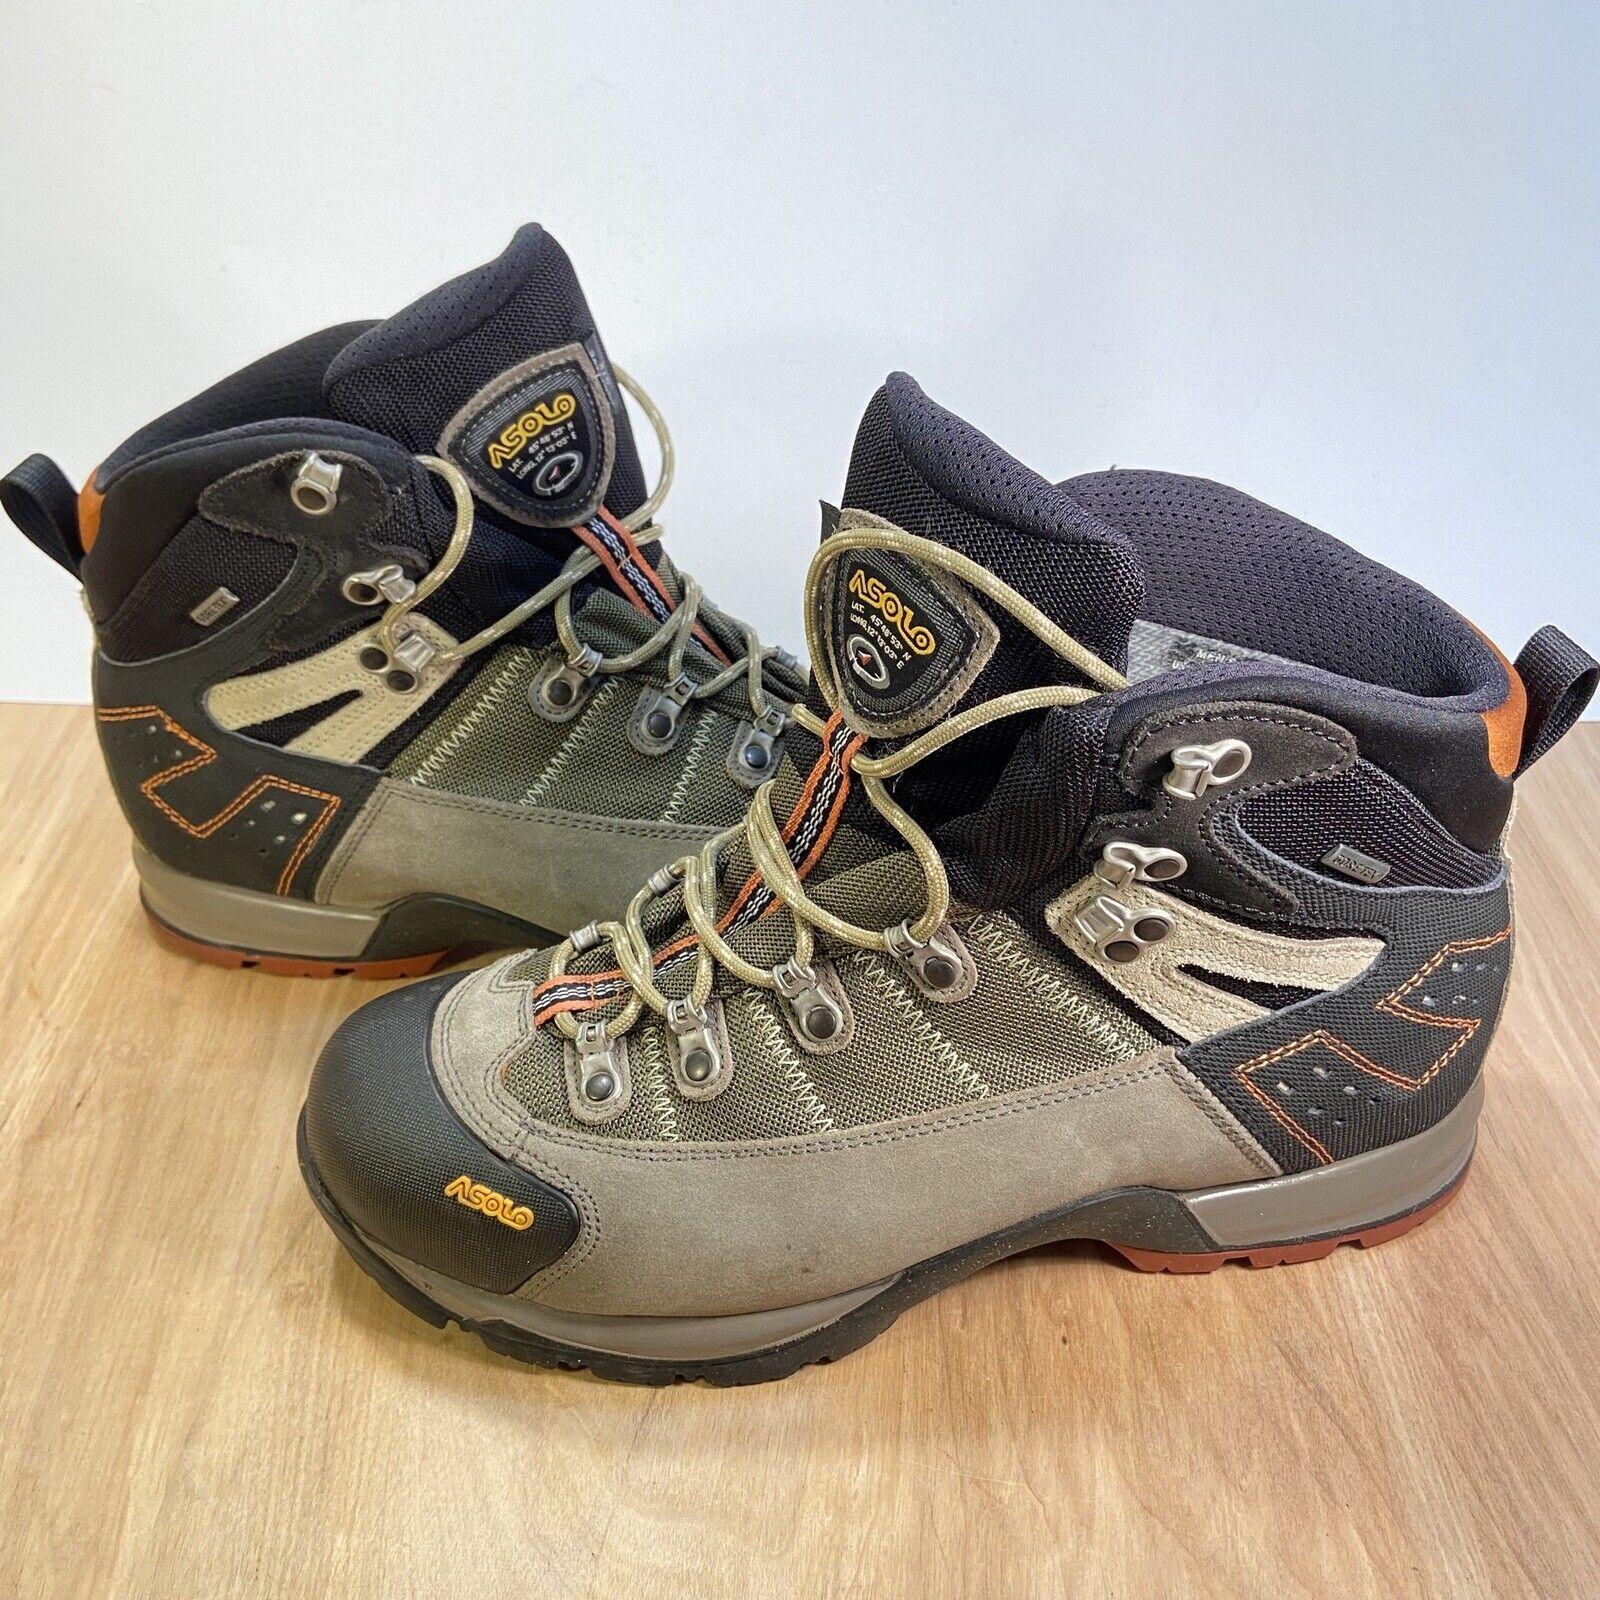 asolo fugitive gtx men's hiking boots